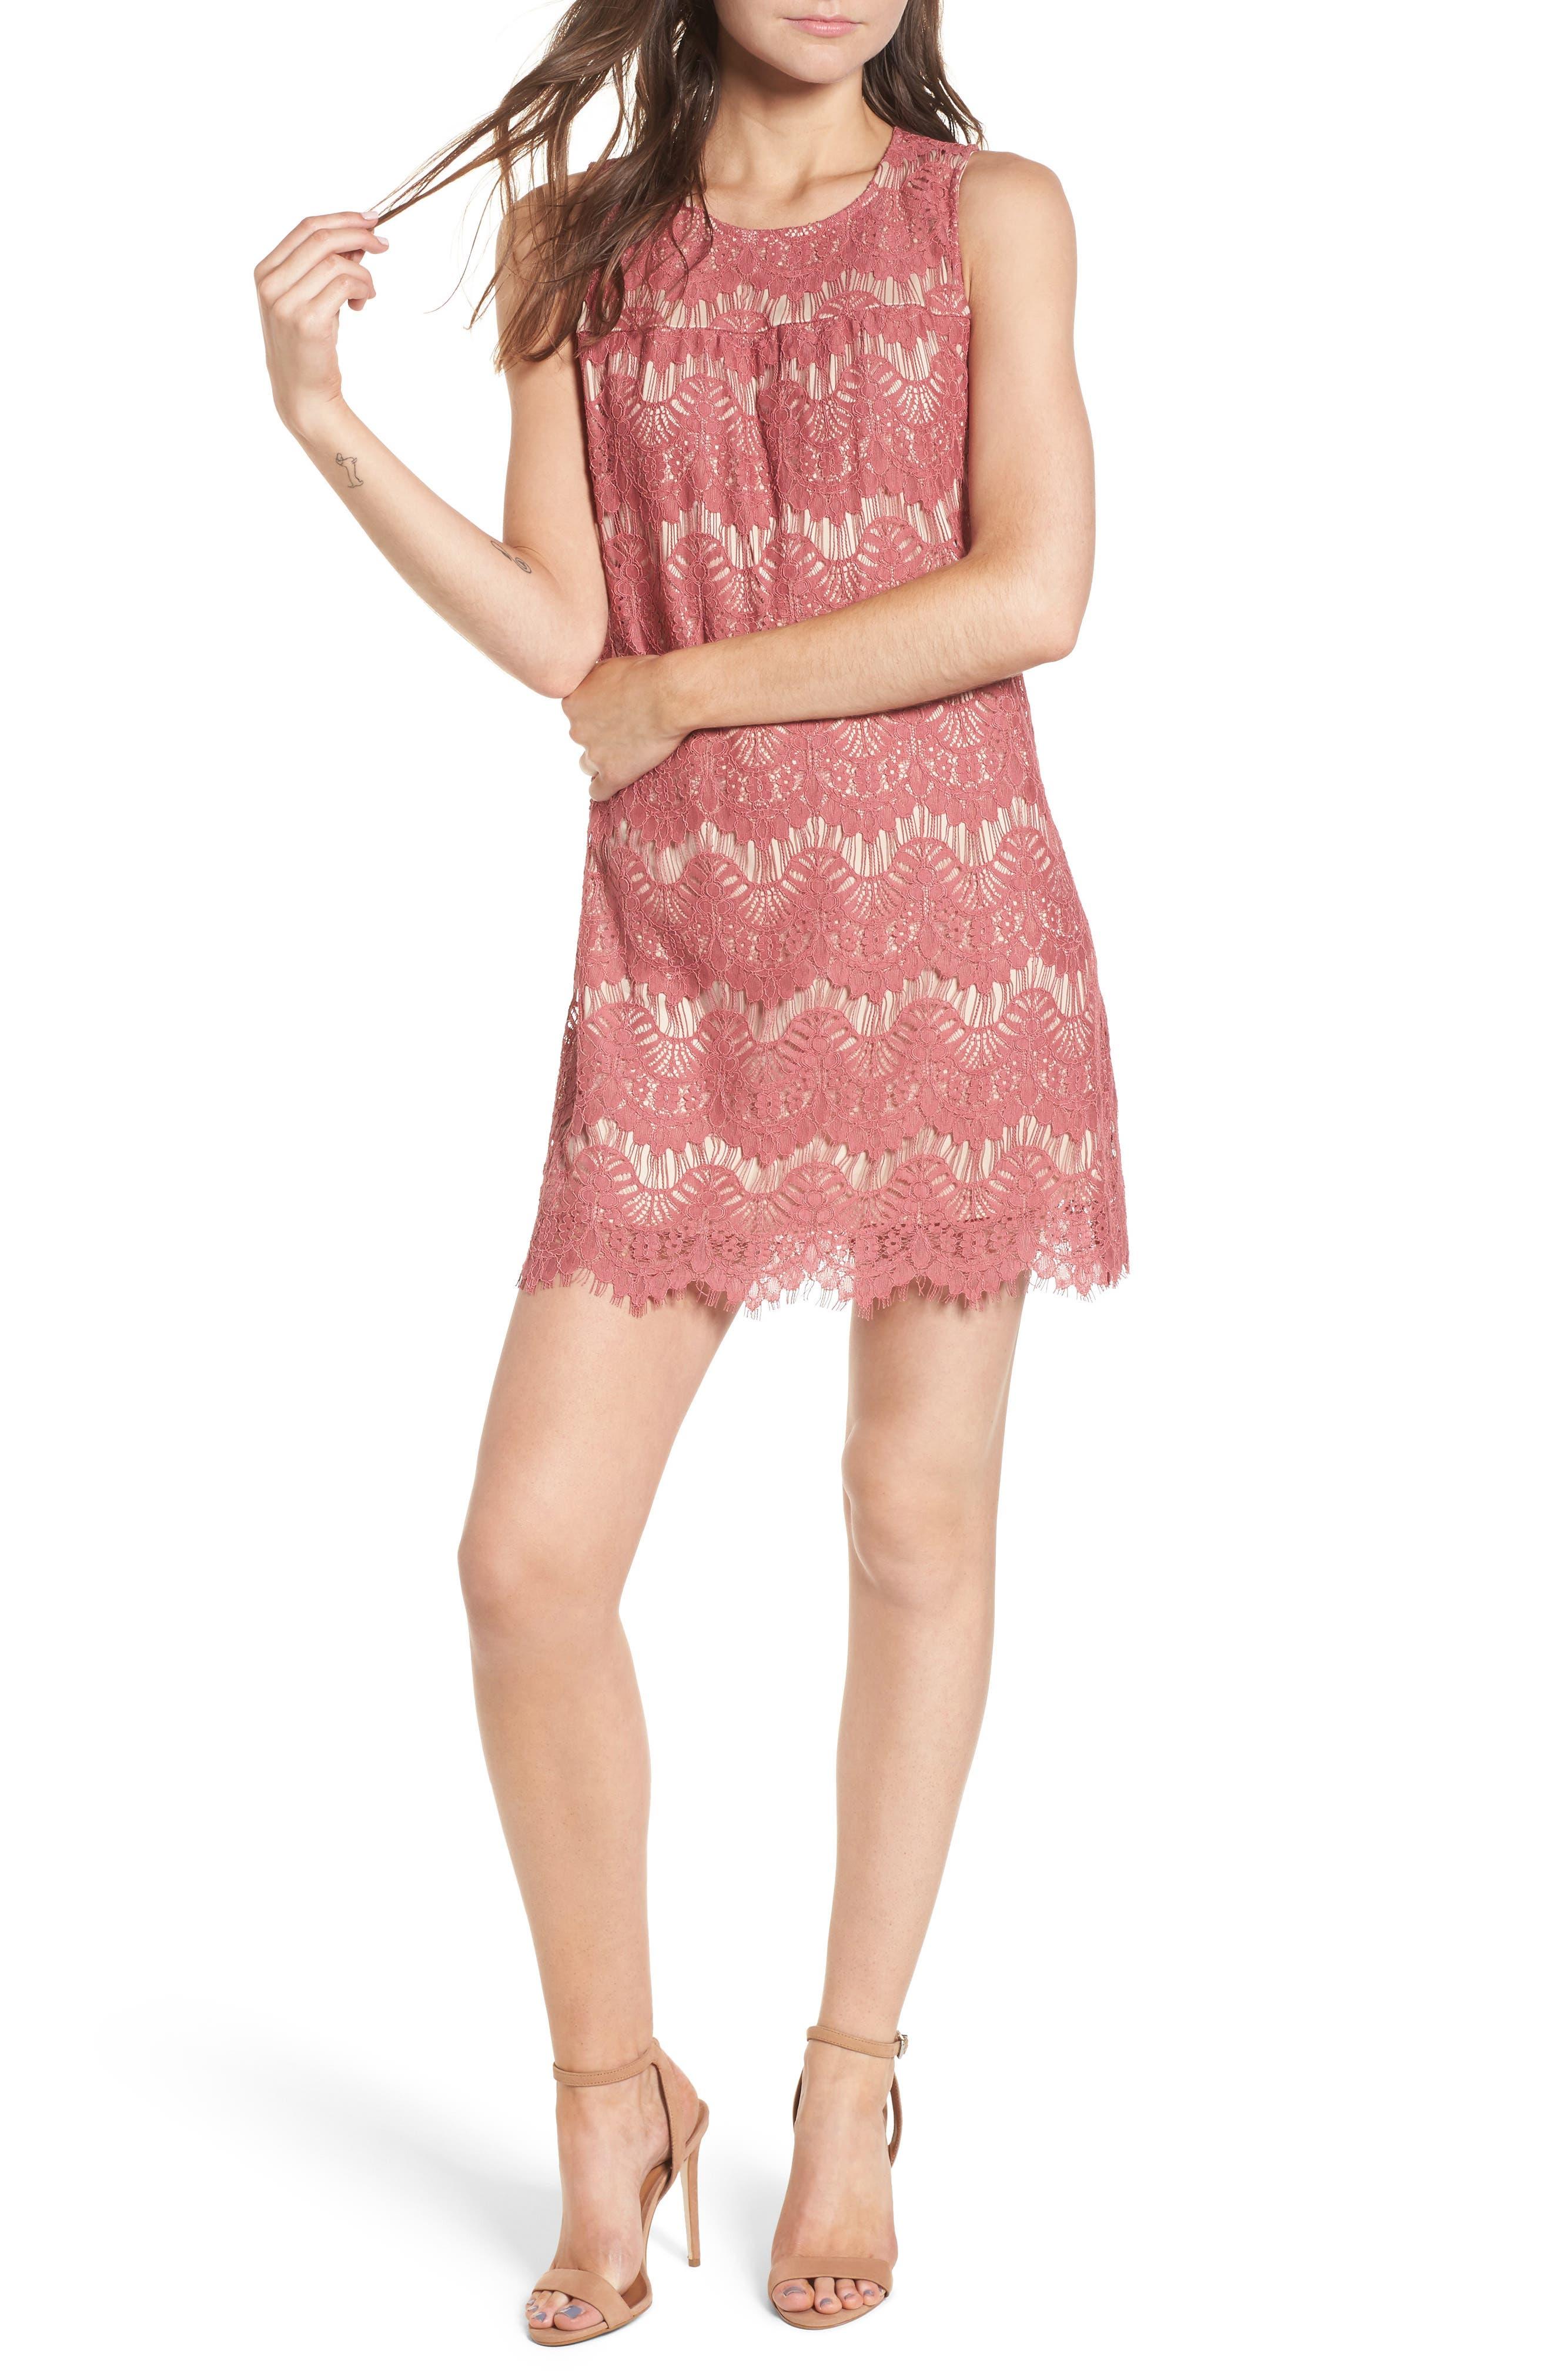 Lace Shift Dress,                             Main thumbnail 1, color,                             Mauve/ Nude